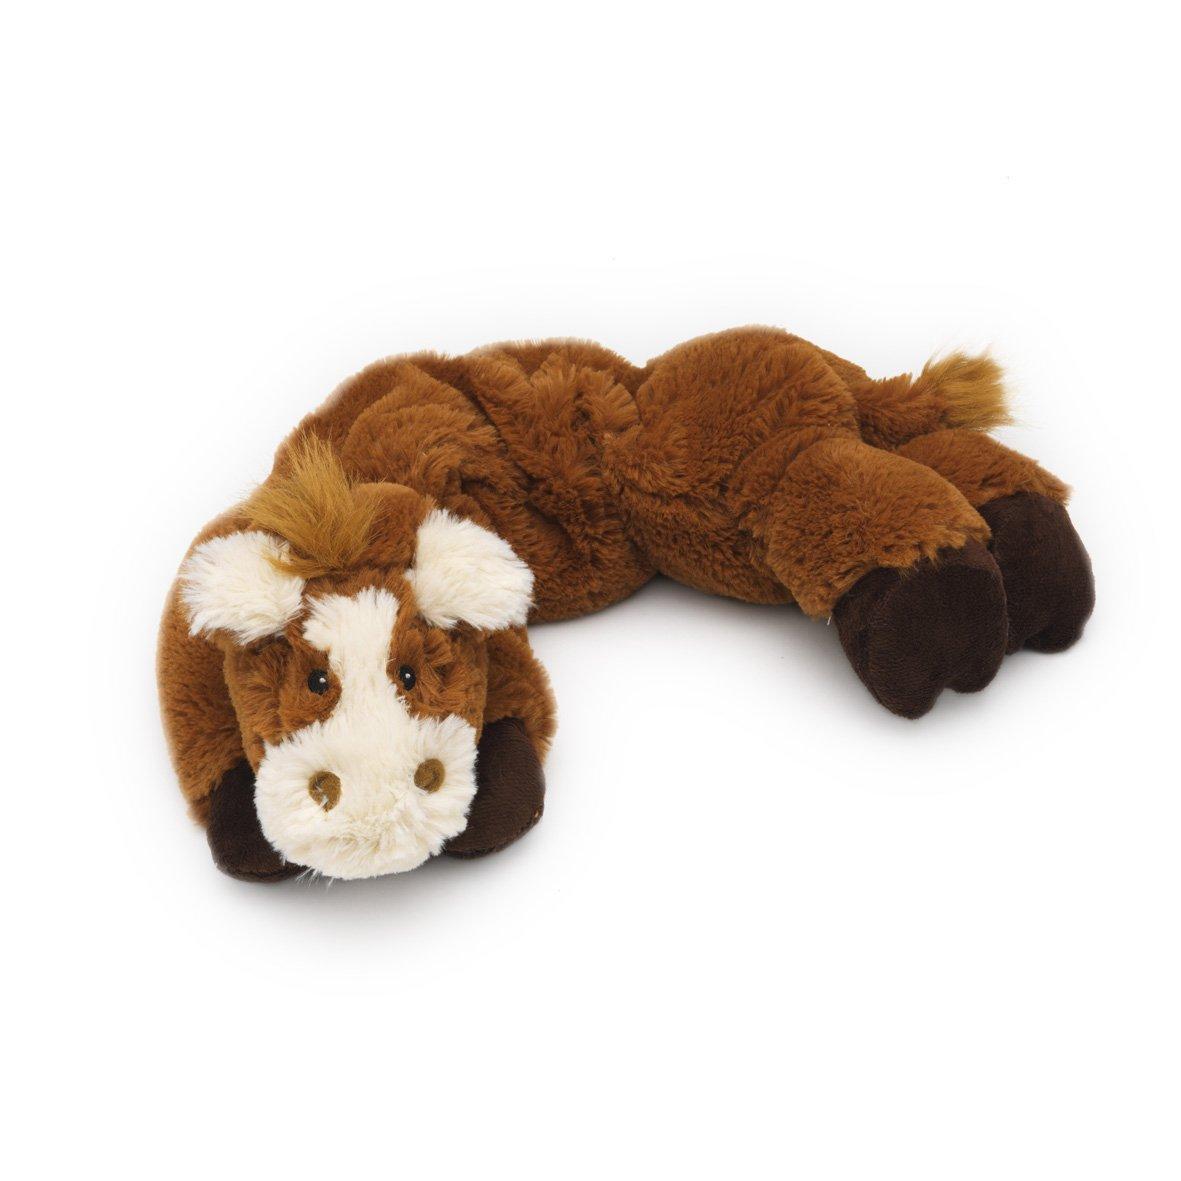 Intelex Cozy Therapeutic Wrap, Horse